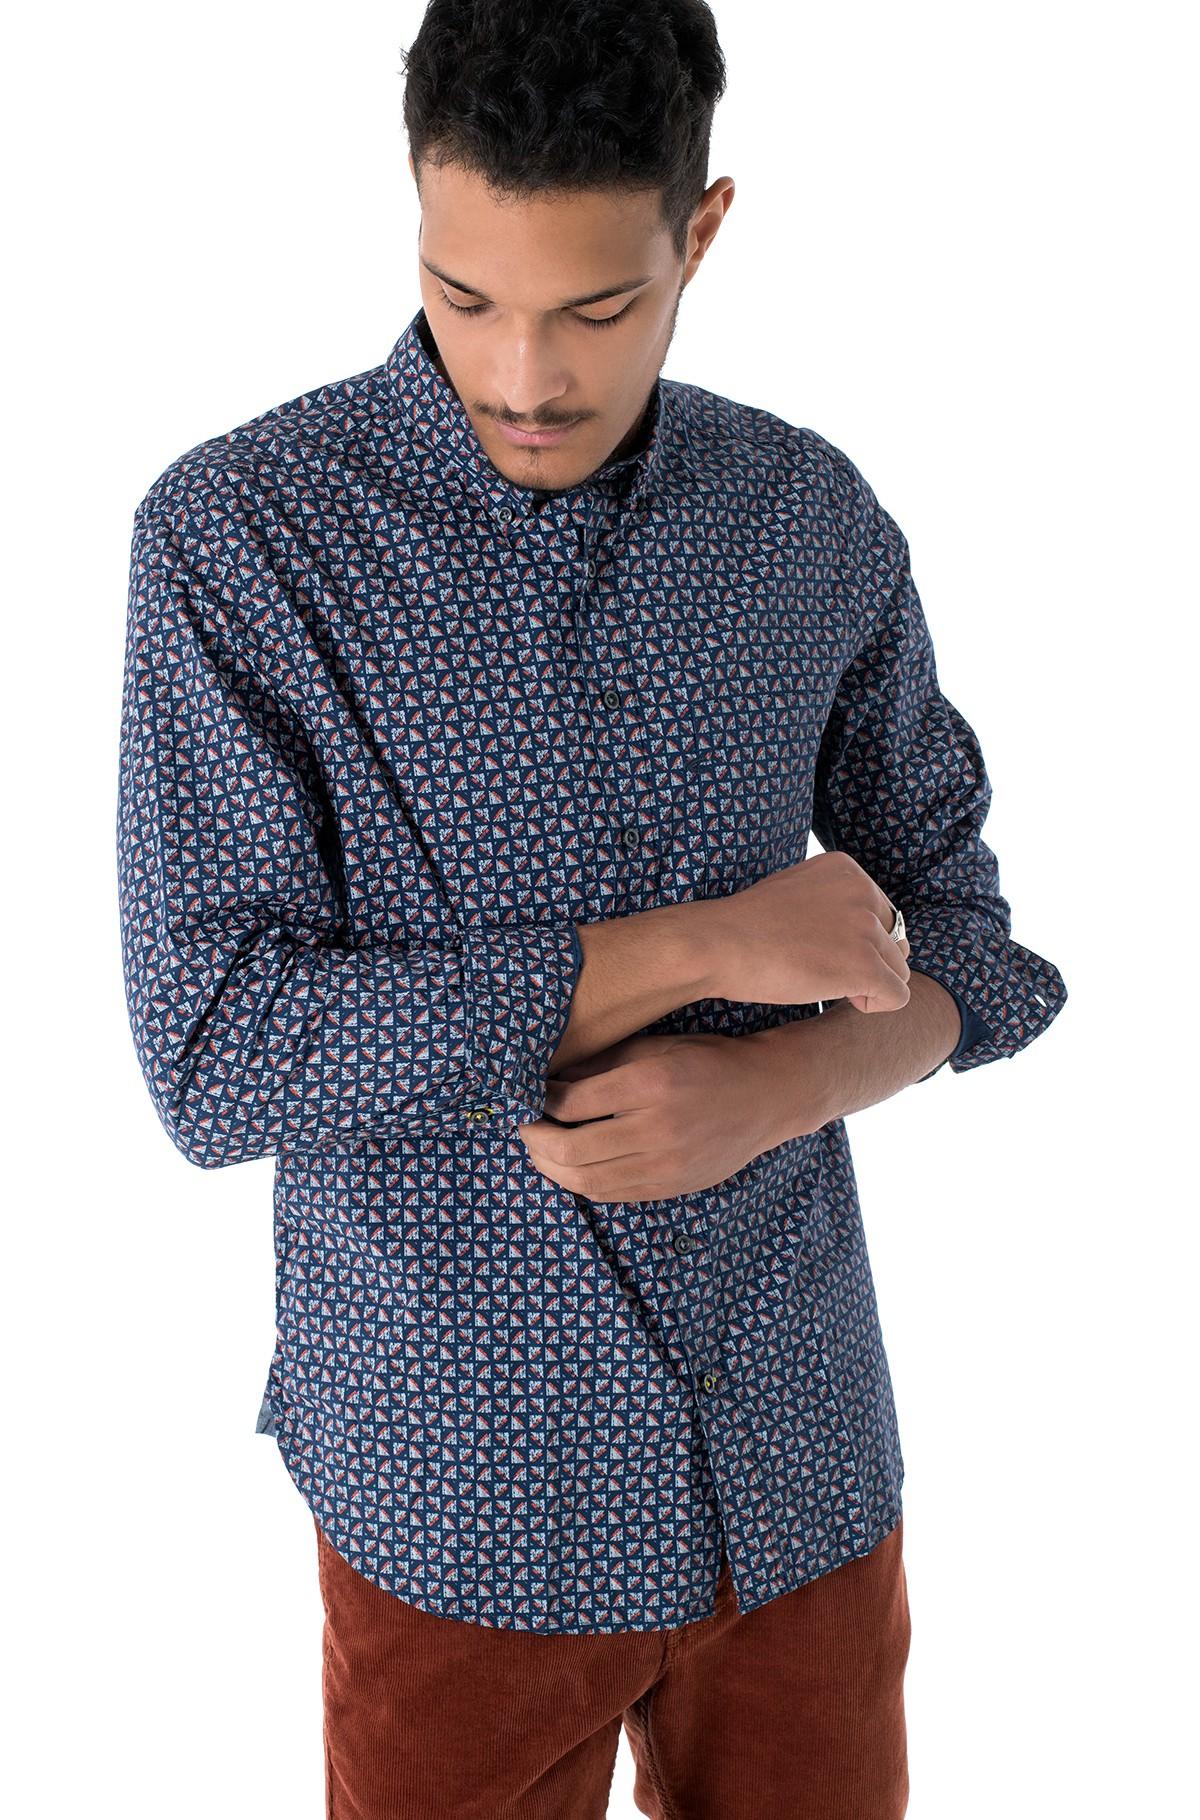 Marškiniai 409139/4S39-full-1